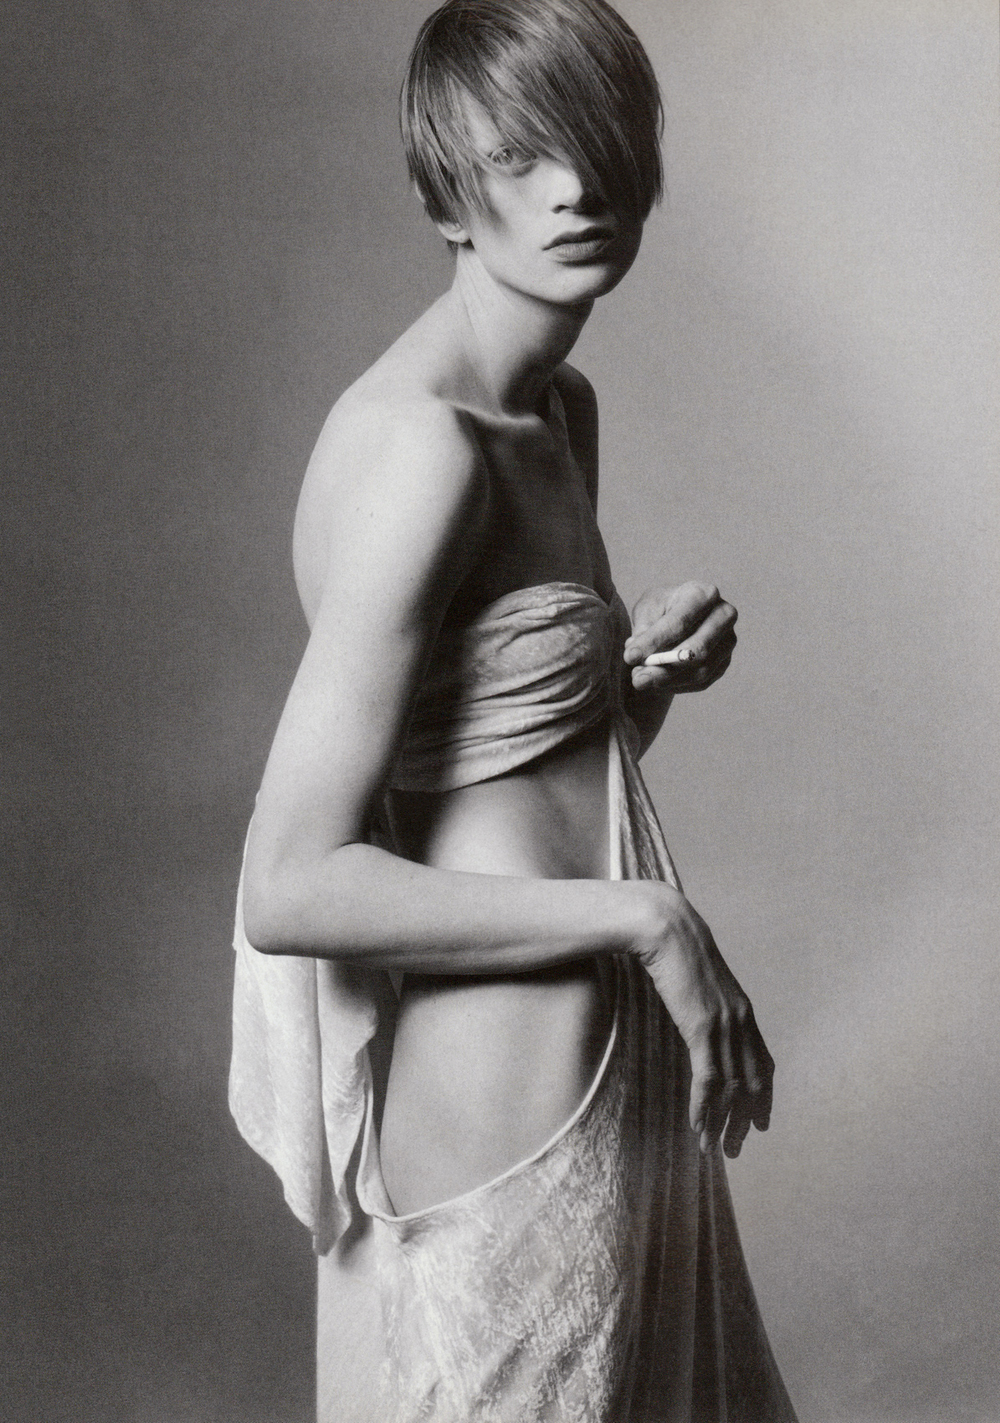 Kristen_McMenamy-Steven_Meisel-1994-photographicpictures.jpg